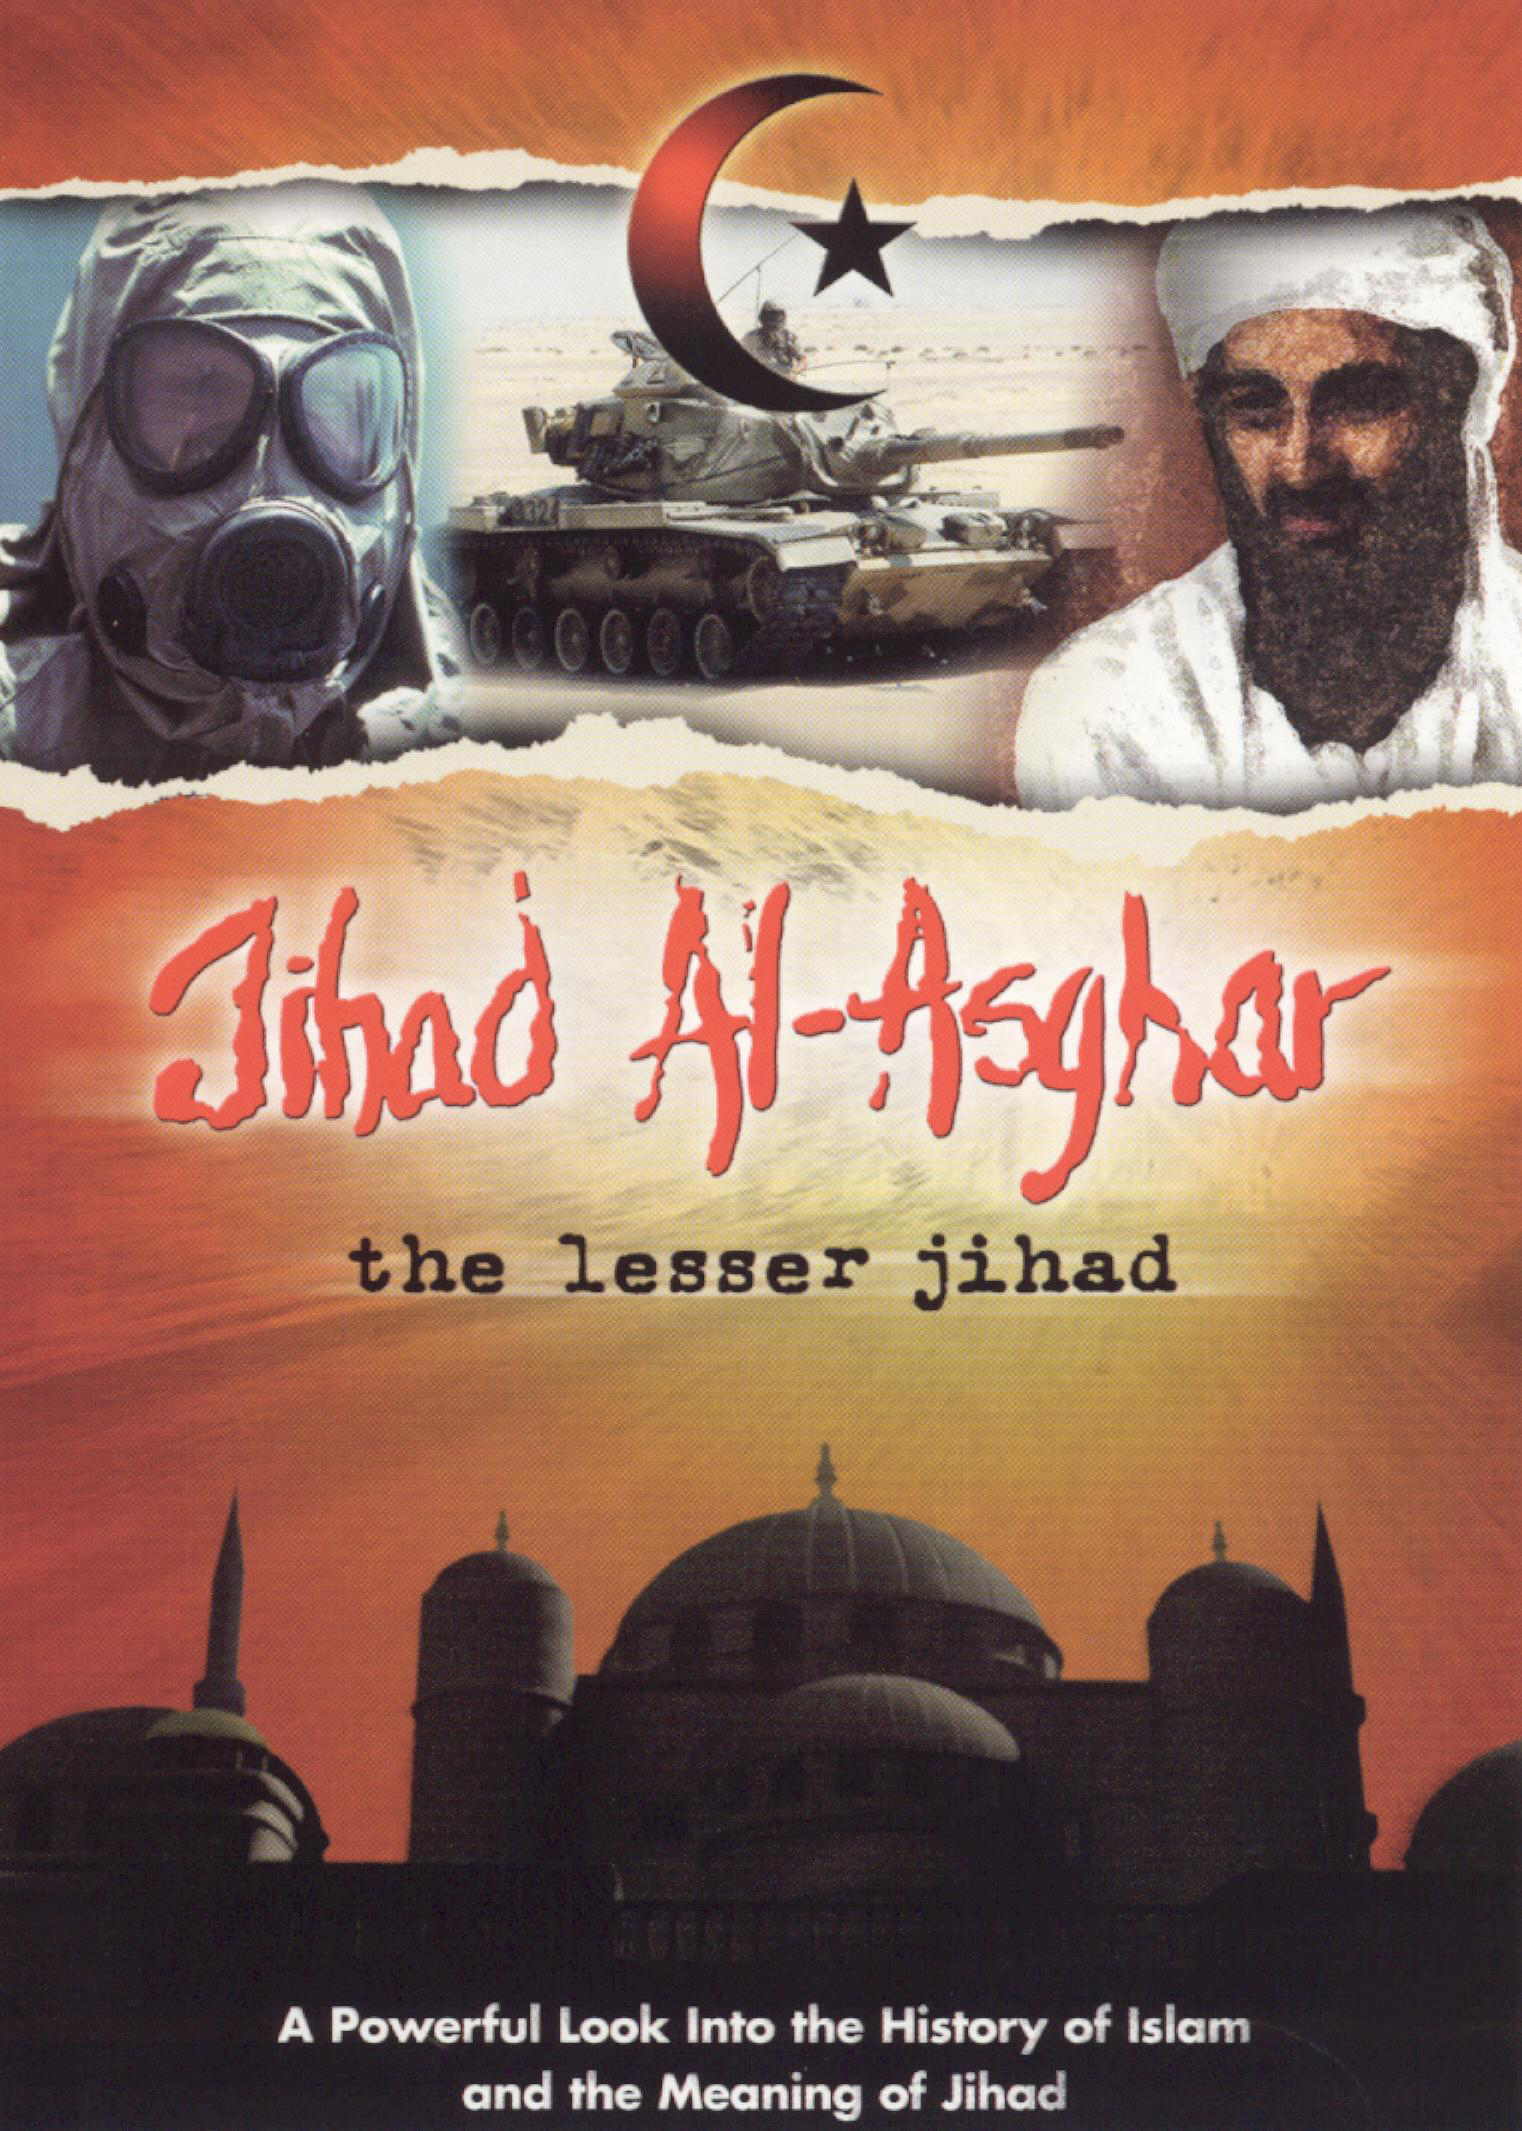 Jihad al-Asghar: The Lesser Jihad